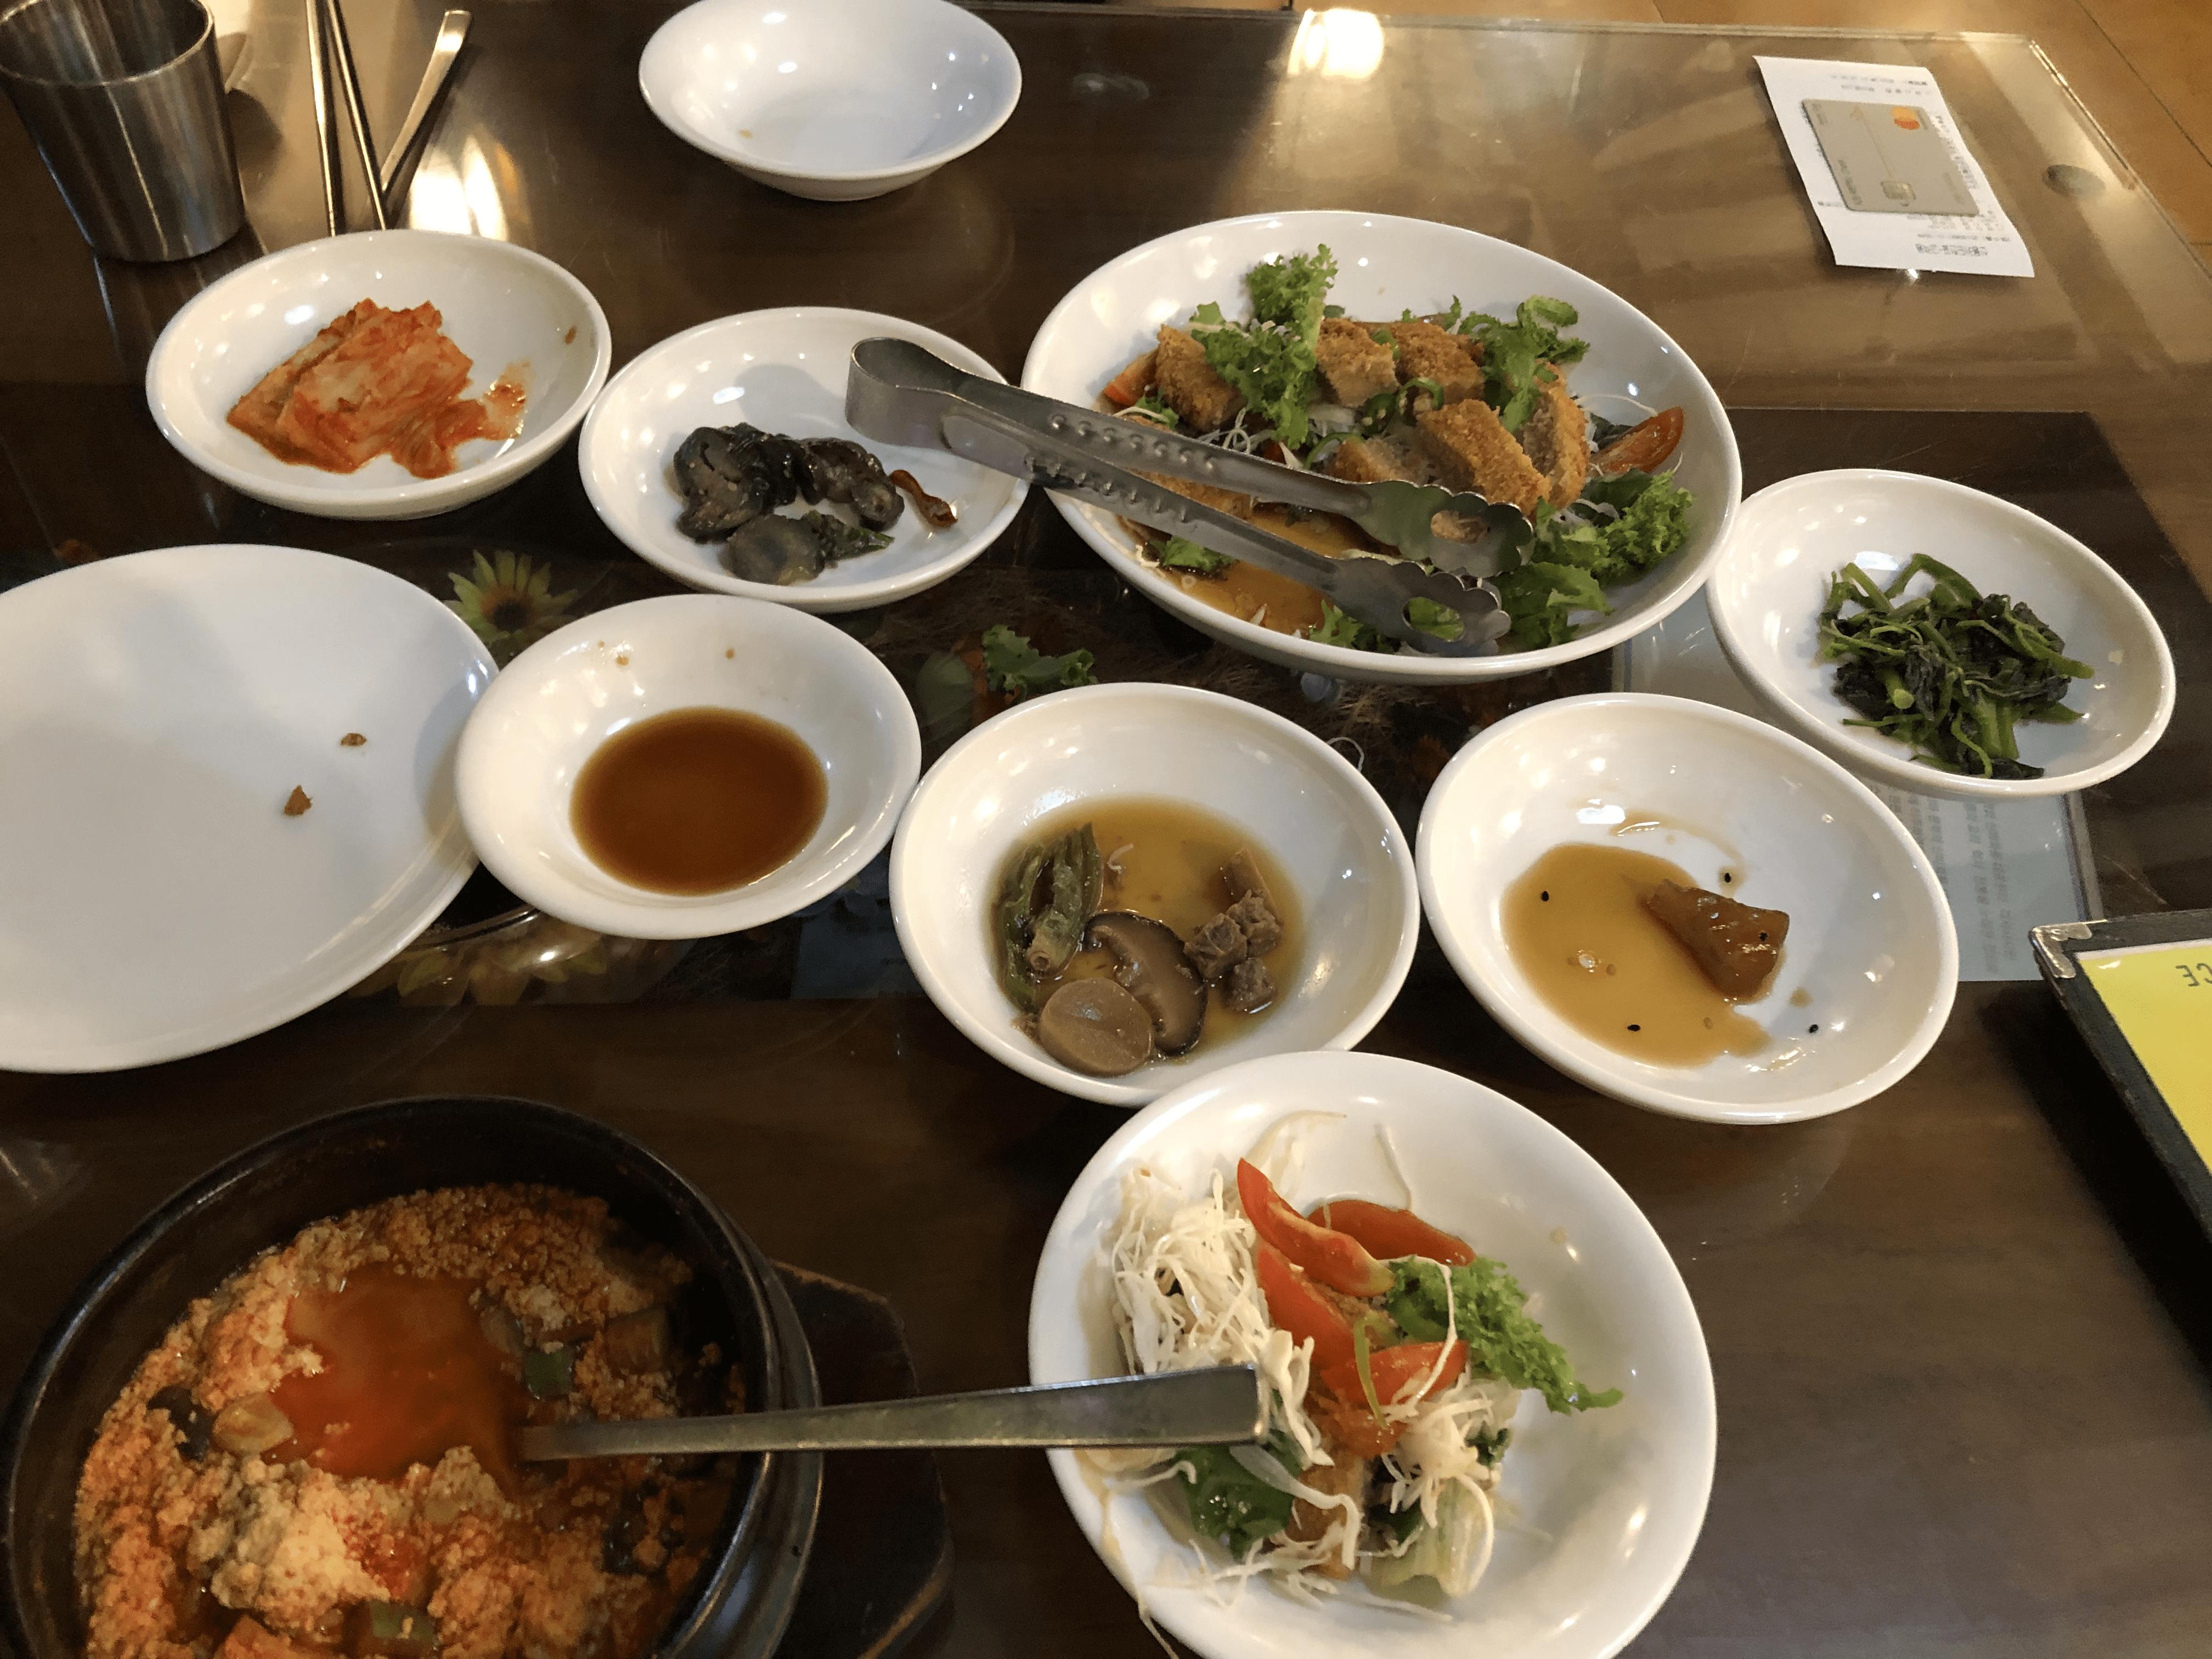 Seoul food feast